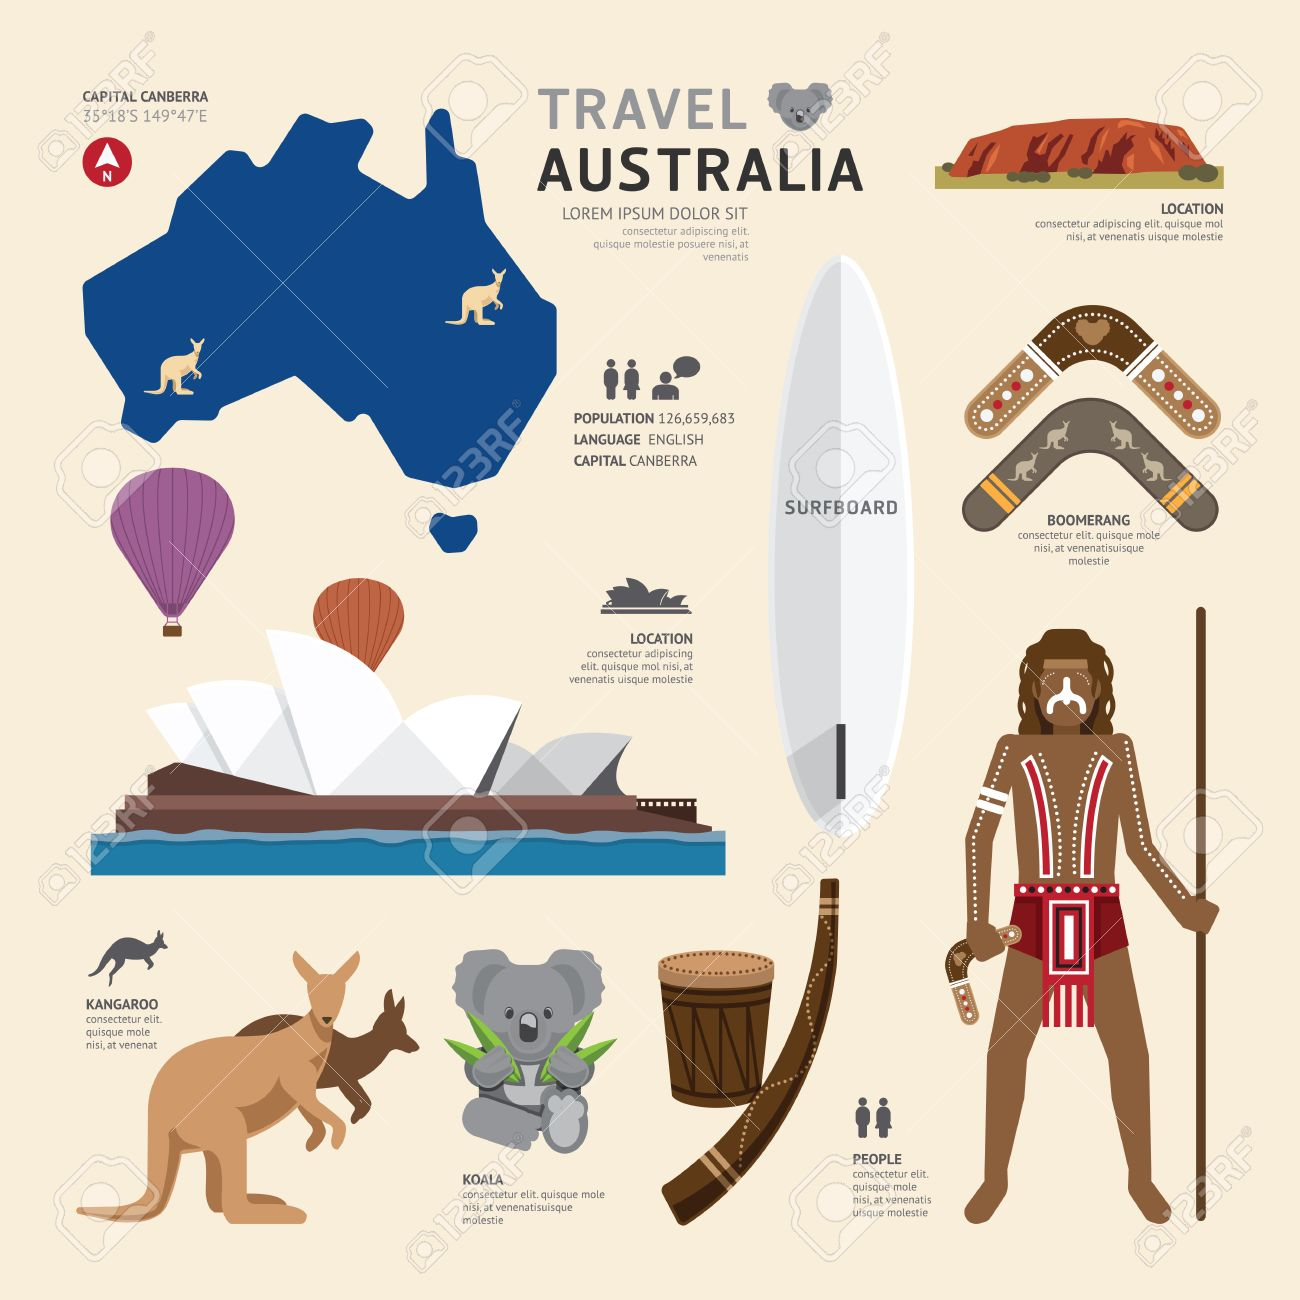 620 Australia Boomerang Stock Illustrations, Cliparts And Royalty ...